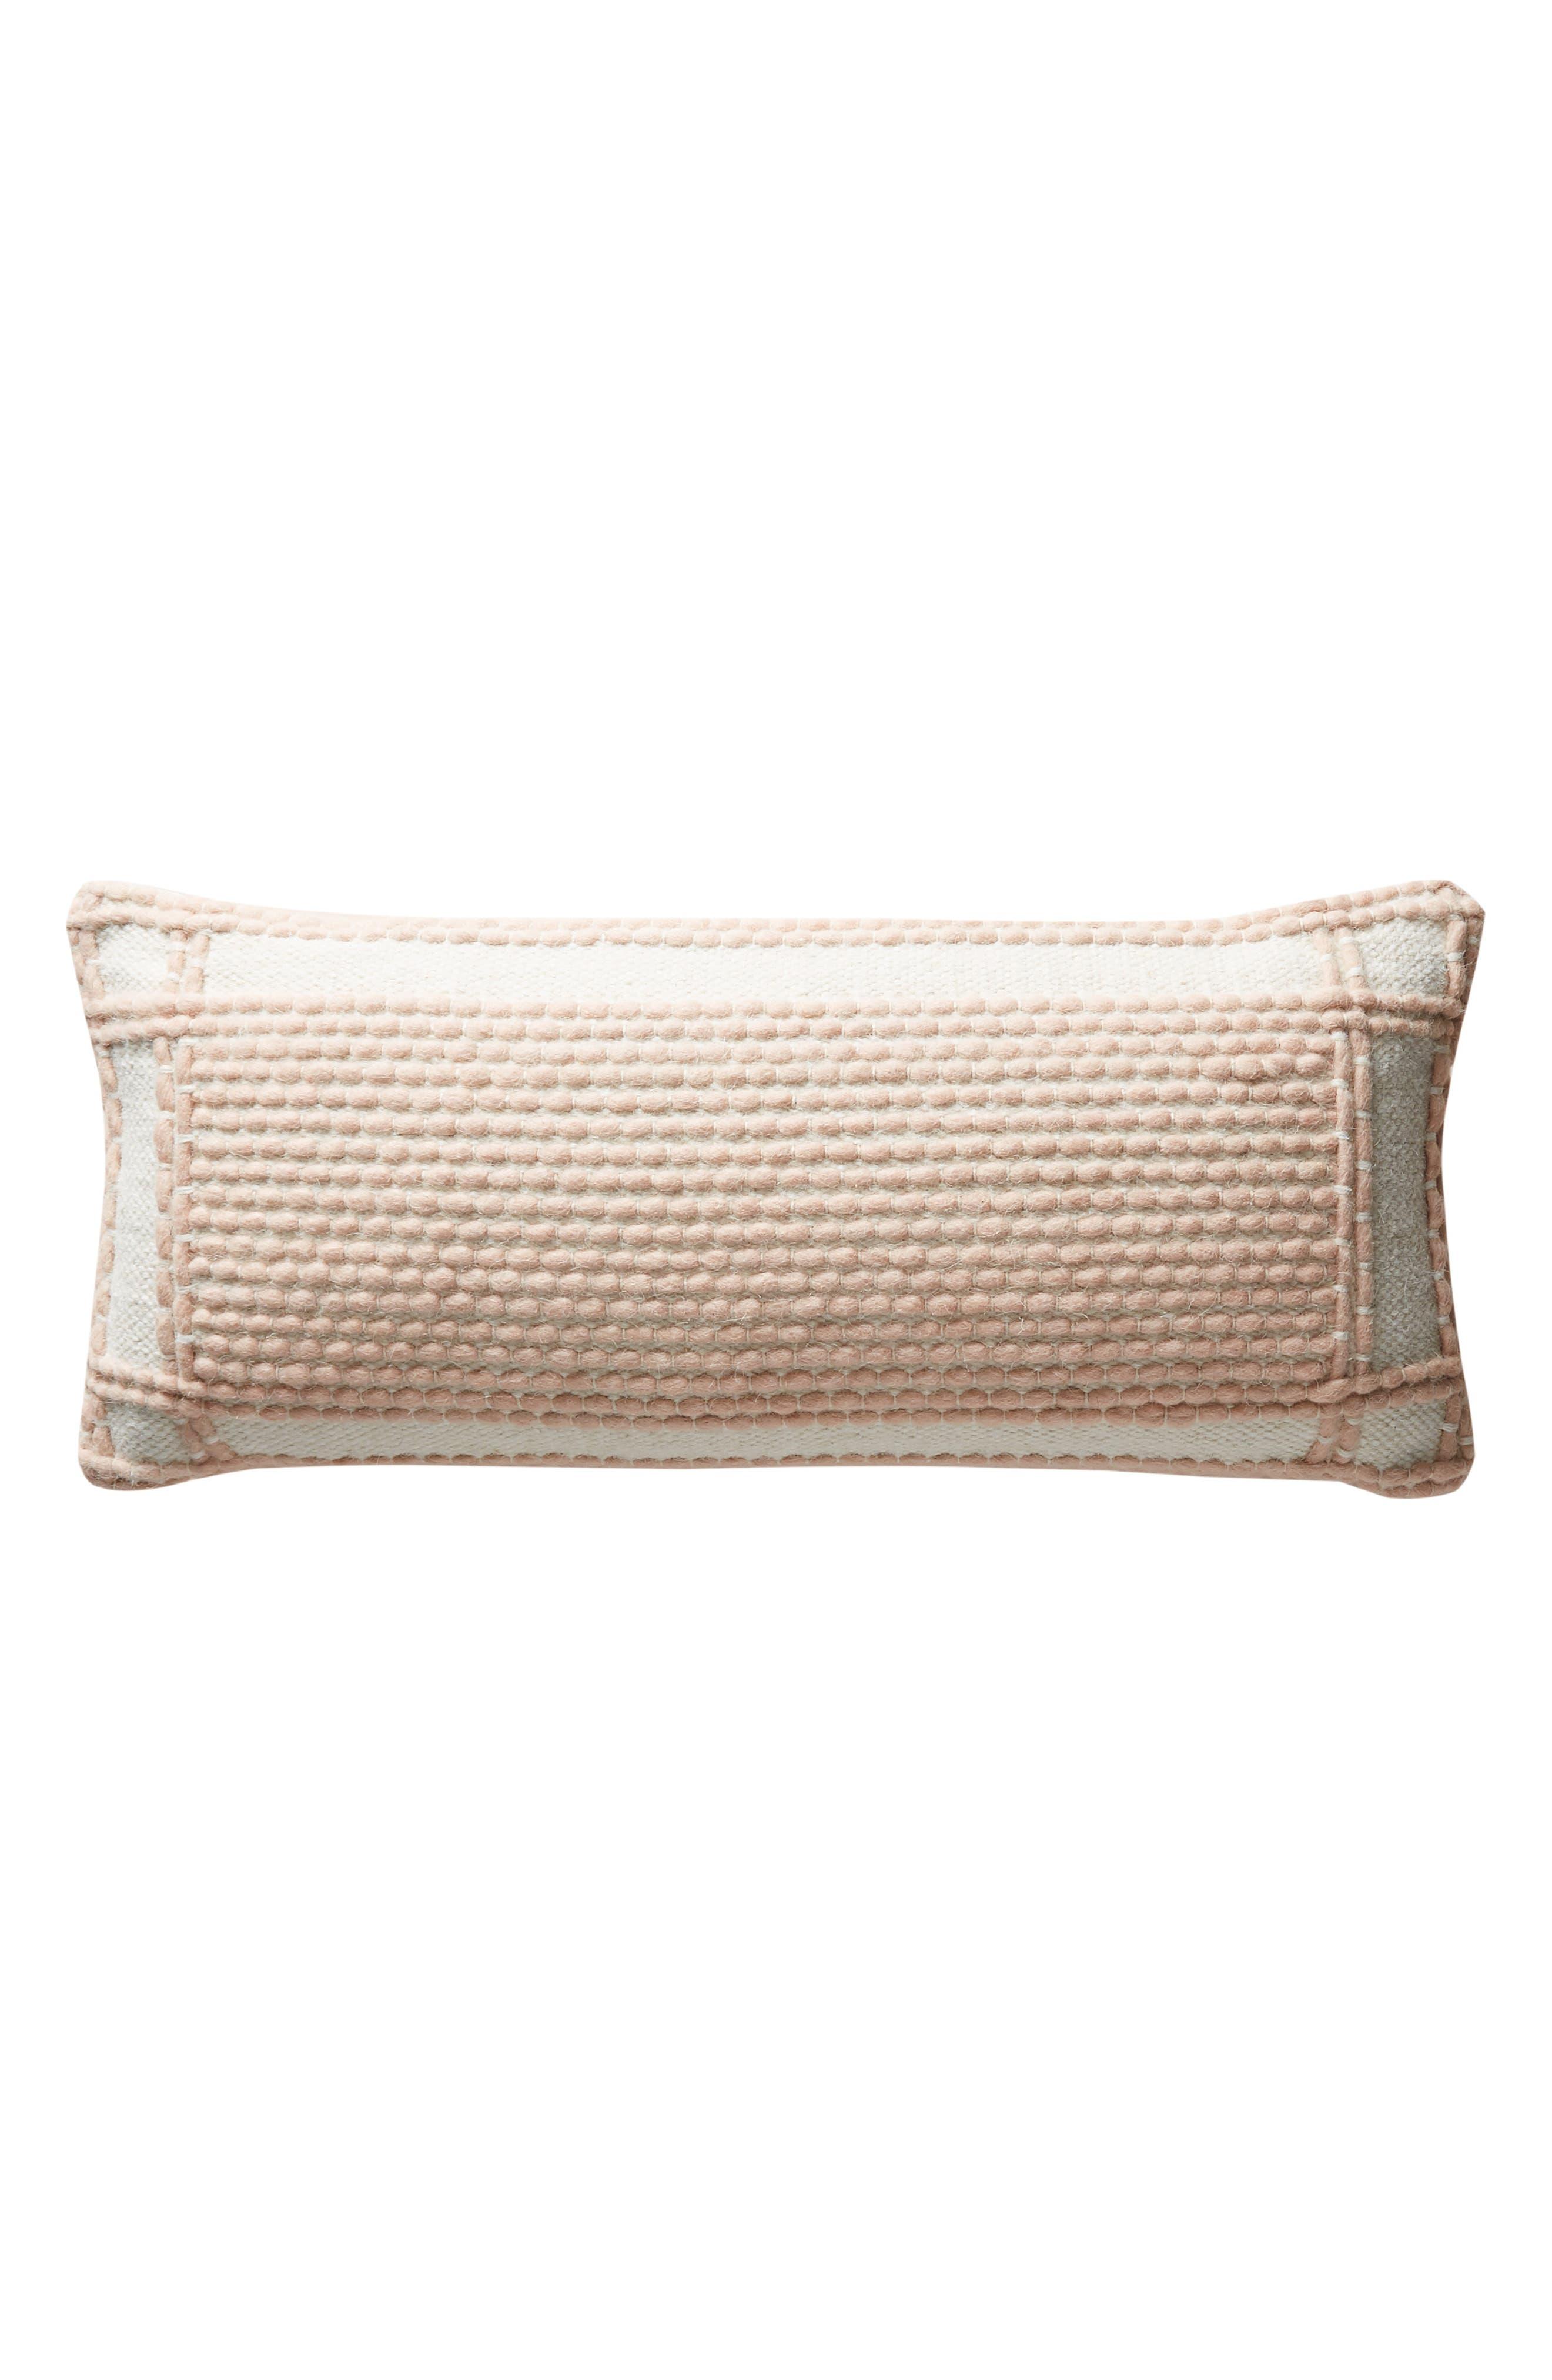 ANTHROPOLOGIE, Evie Bauble Accent Pillow, Alternate thumbnail 5, color, BLUSH